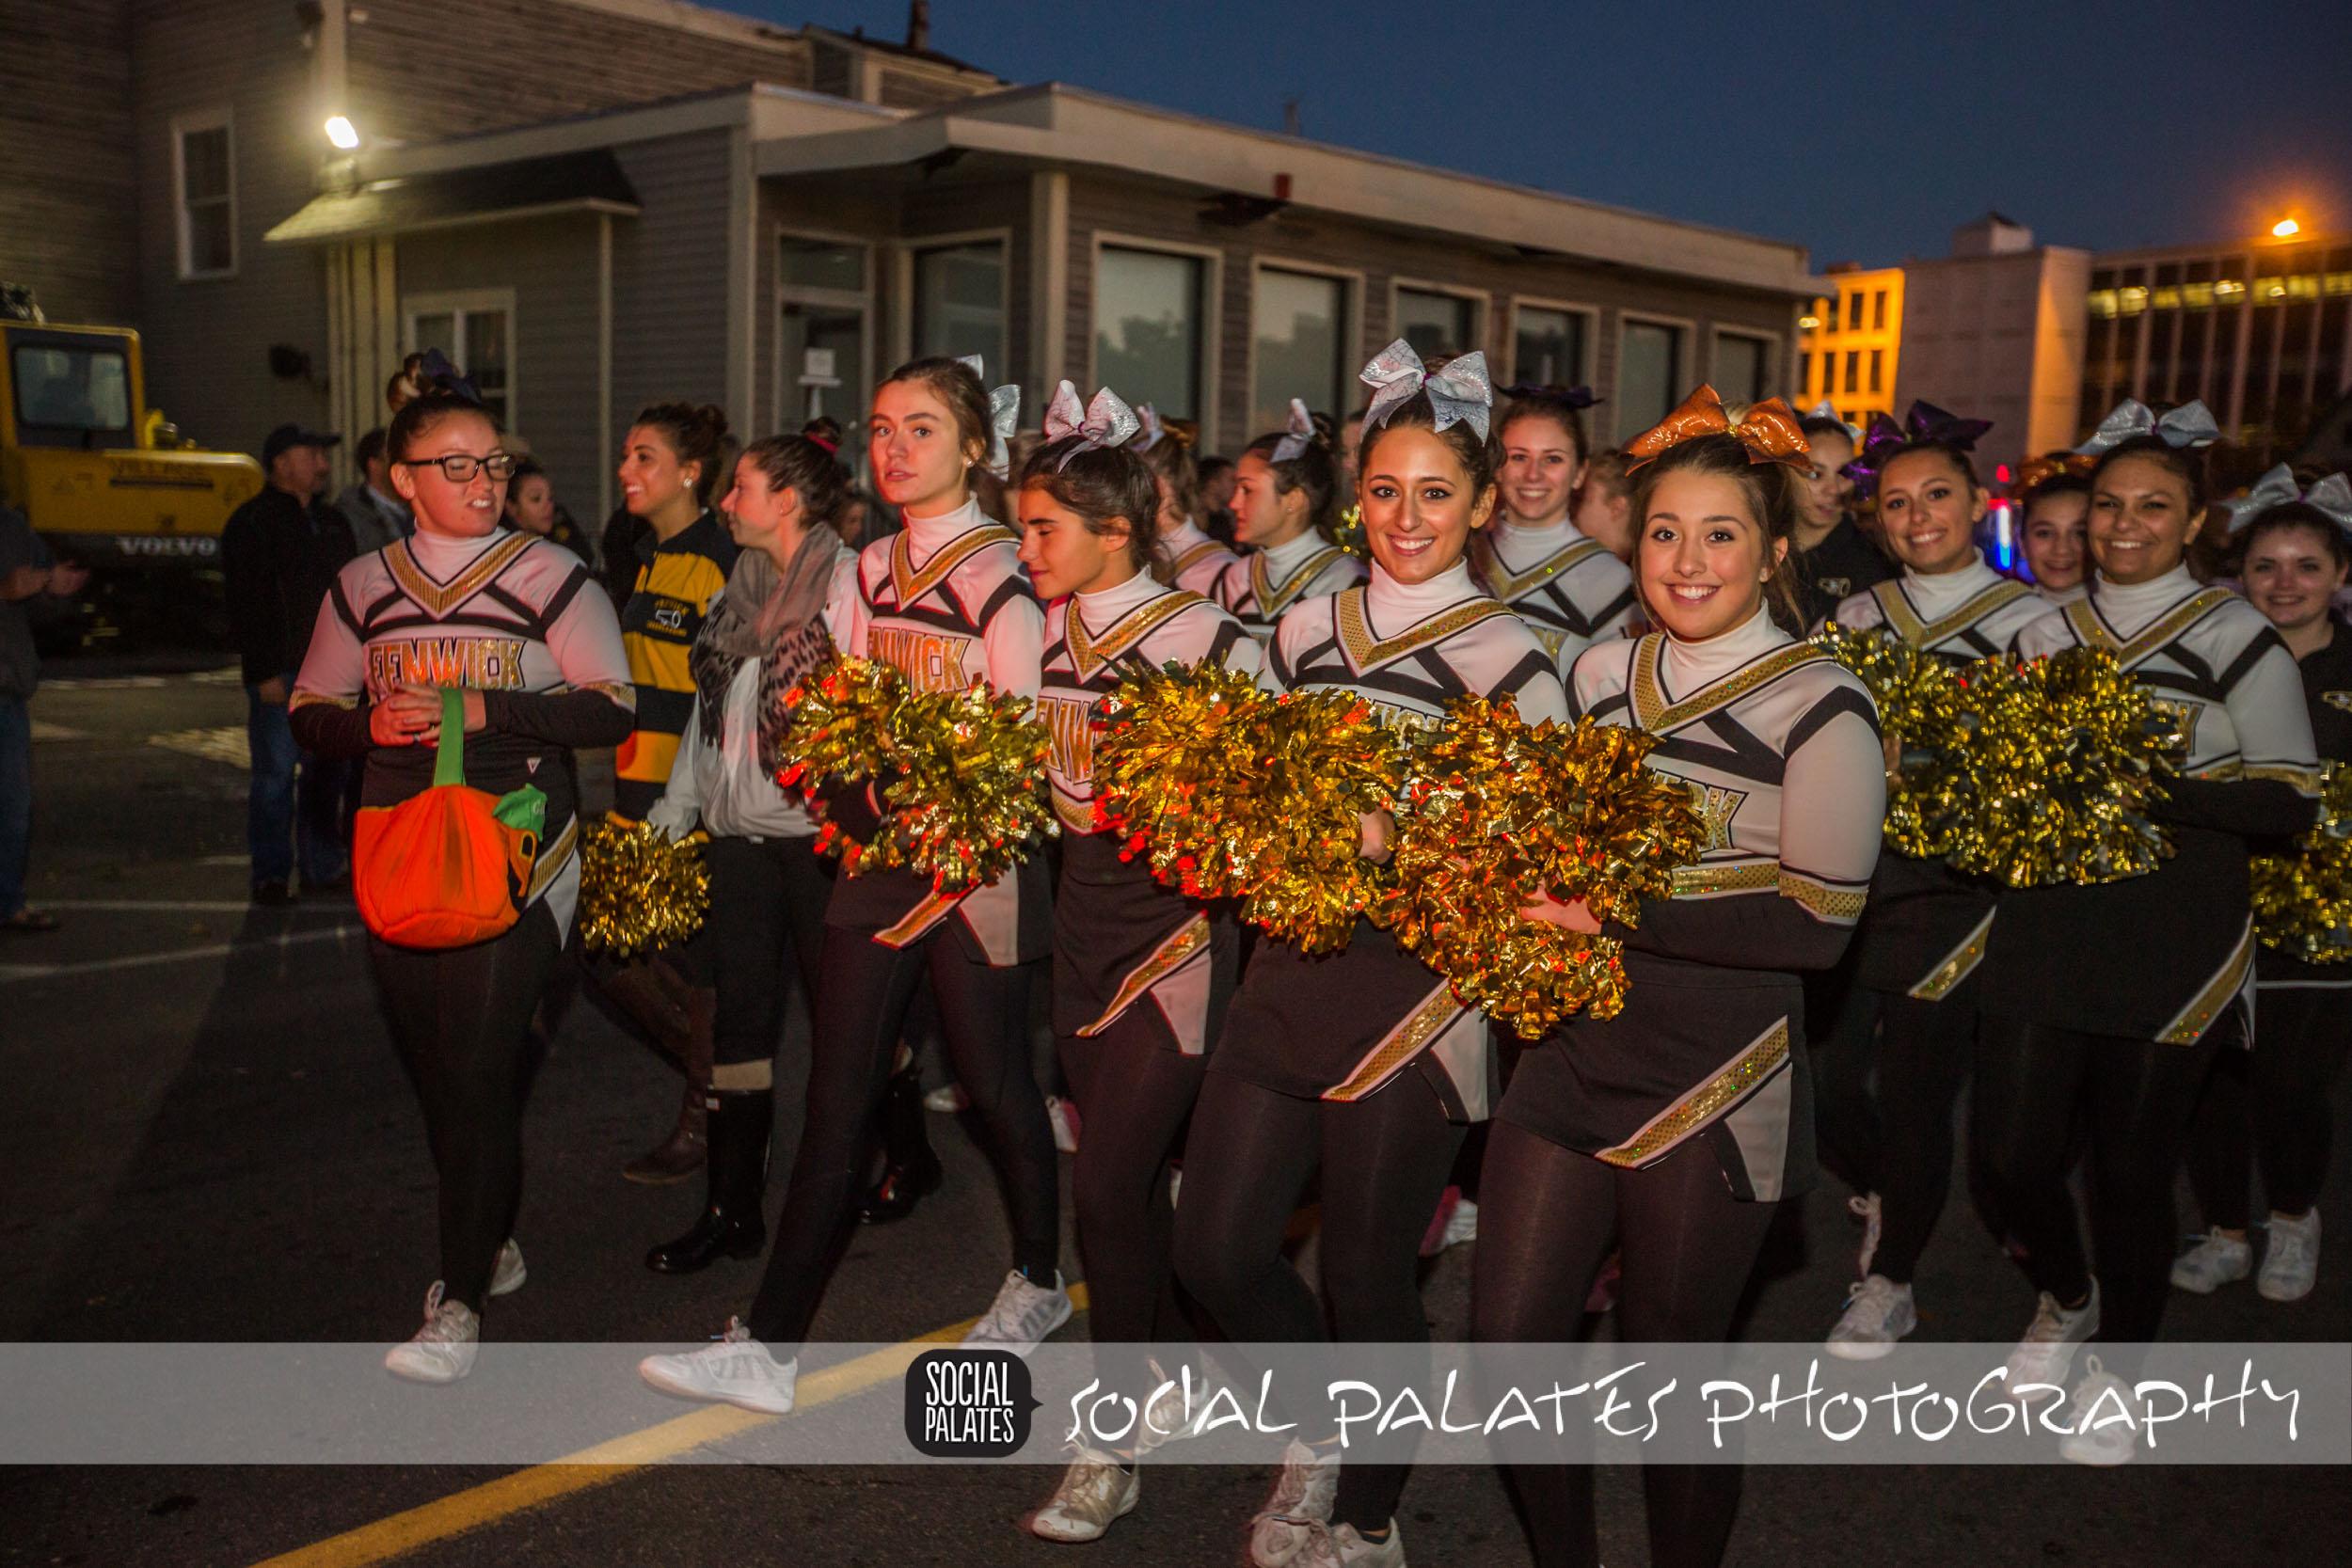 Haunted Happenings Parade 2014 Creative Salem by Social Palates-7456.jpg